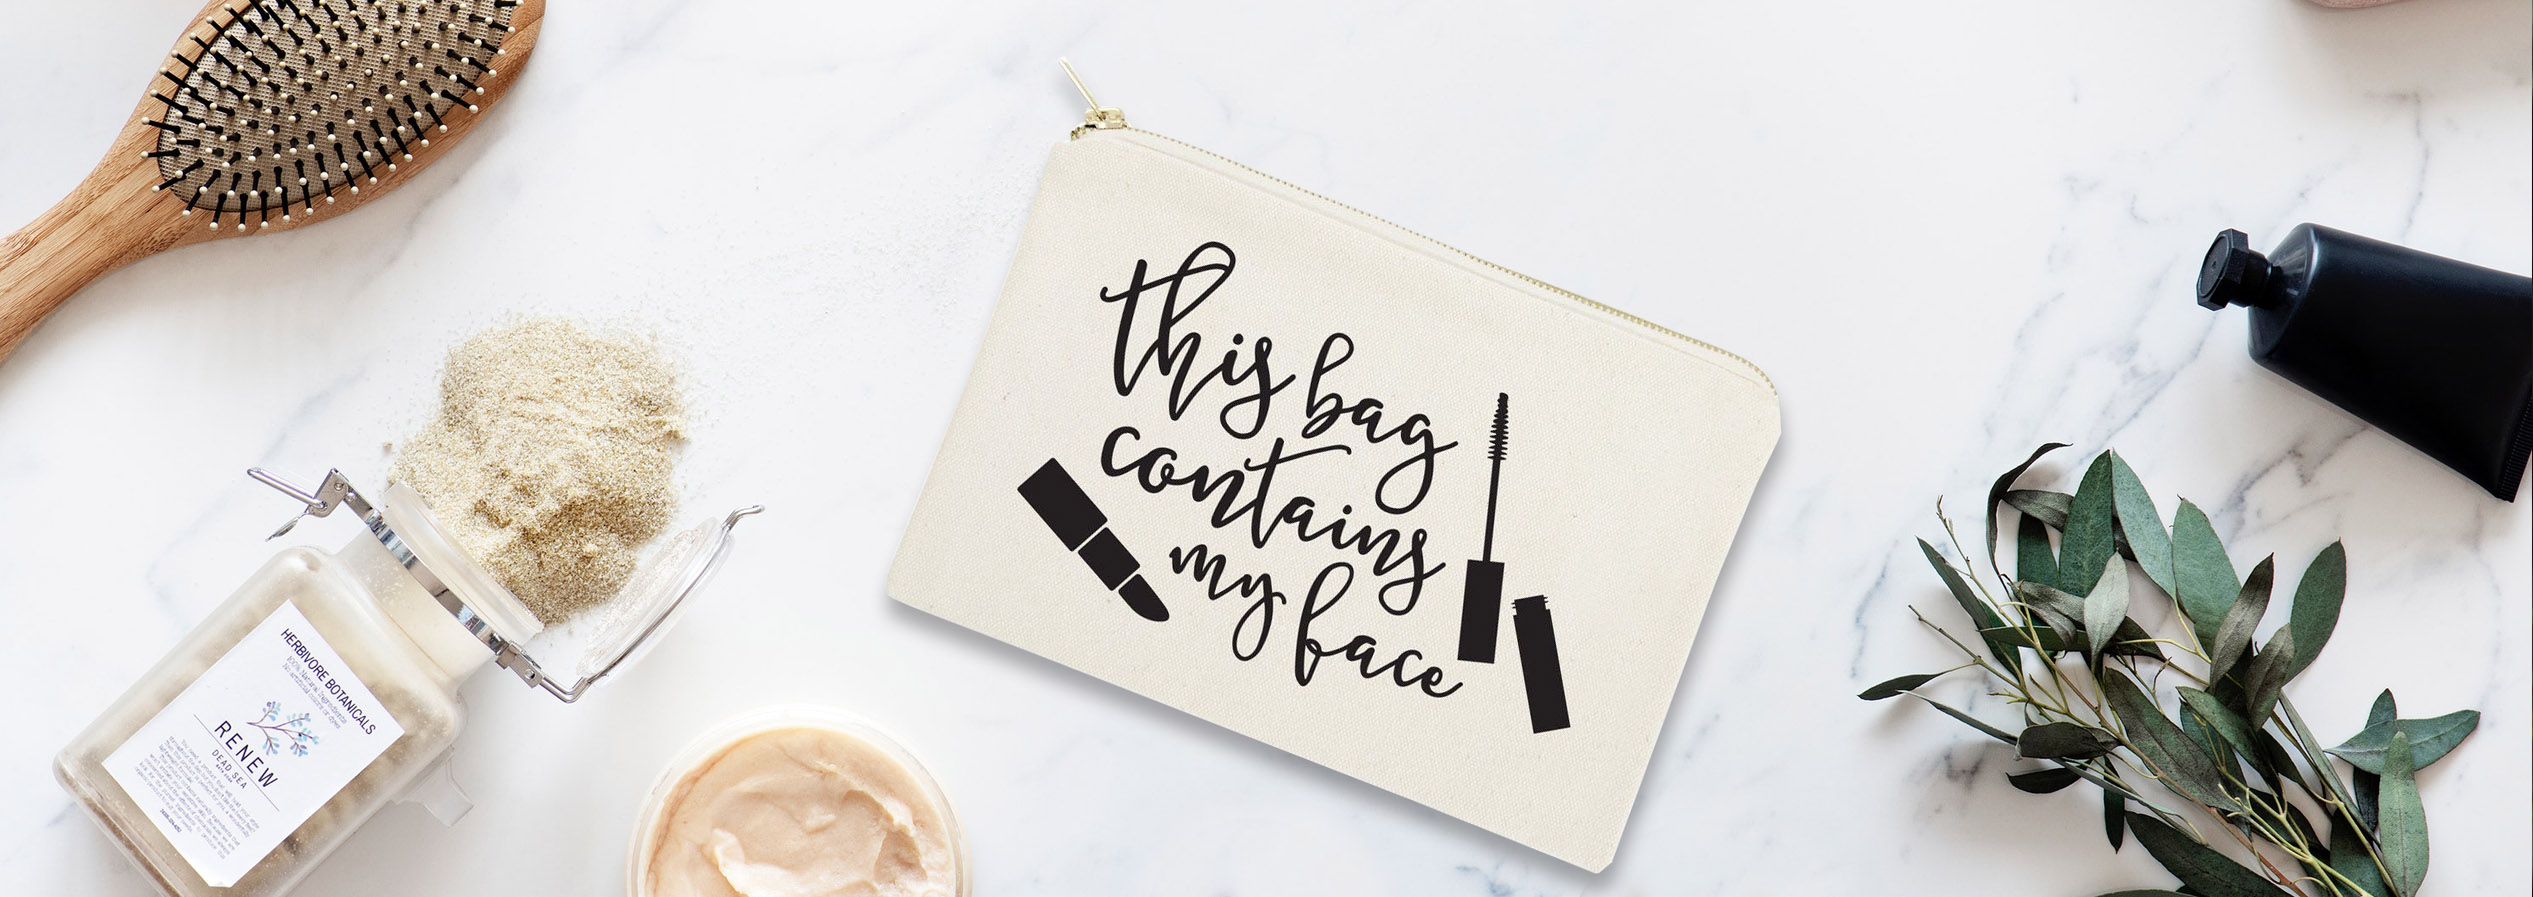 Customized cosmetic bags